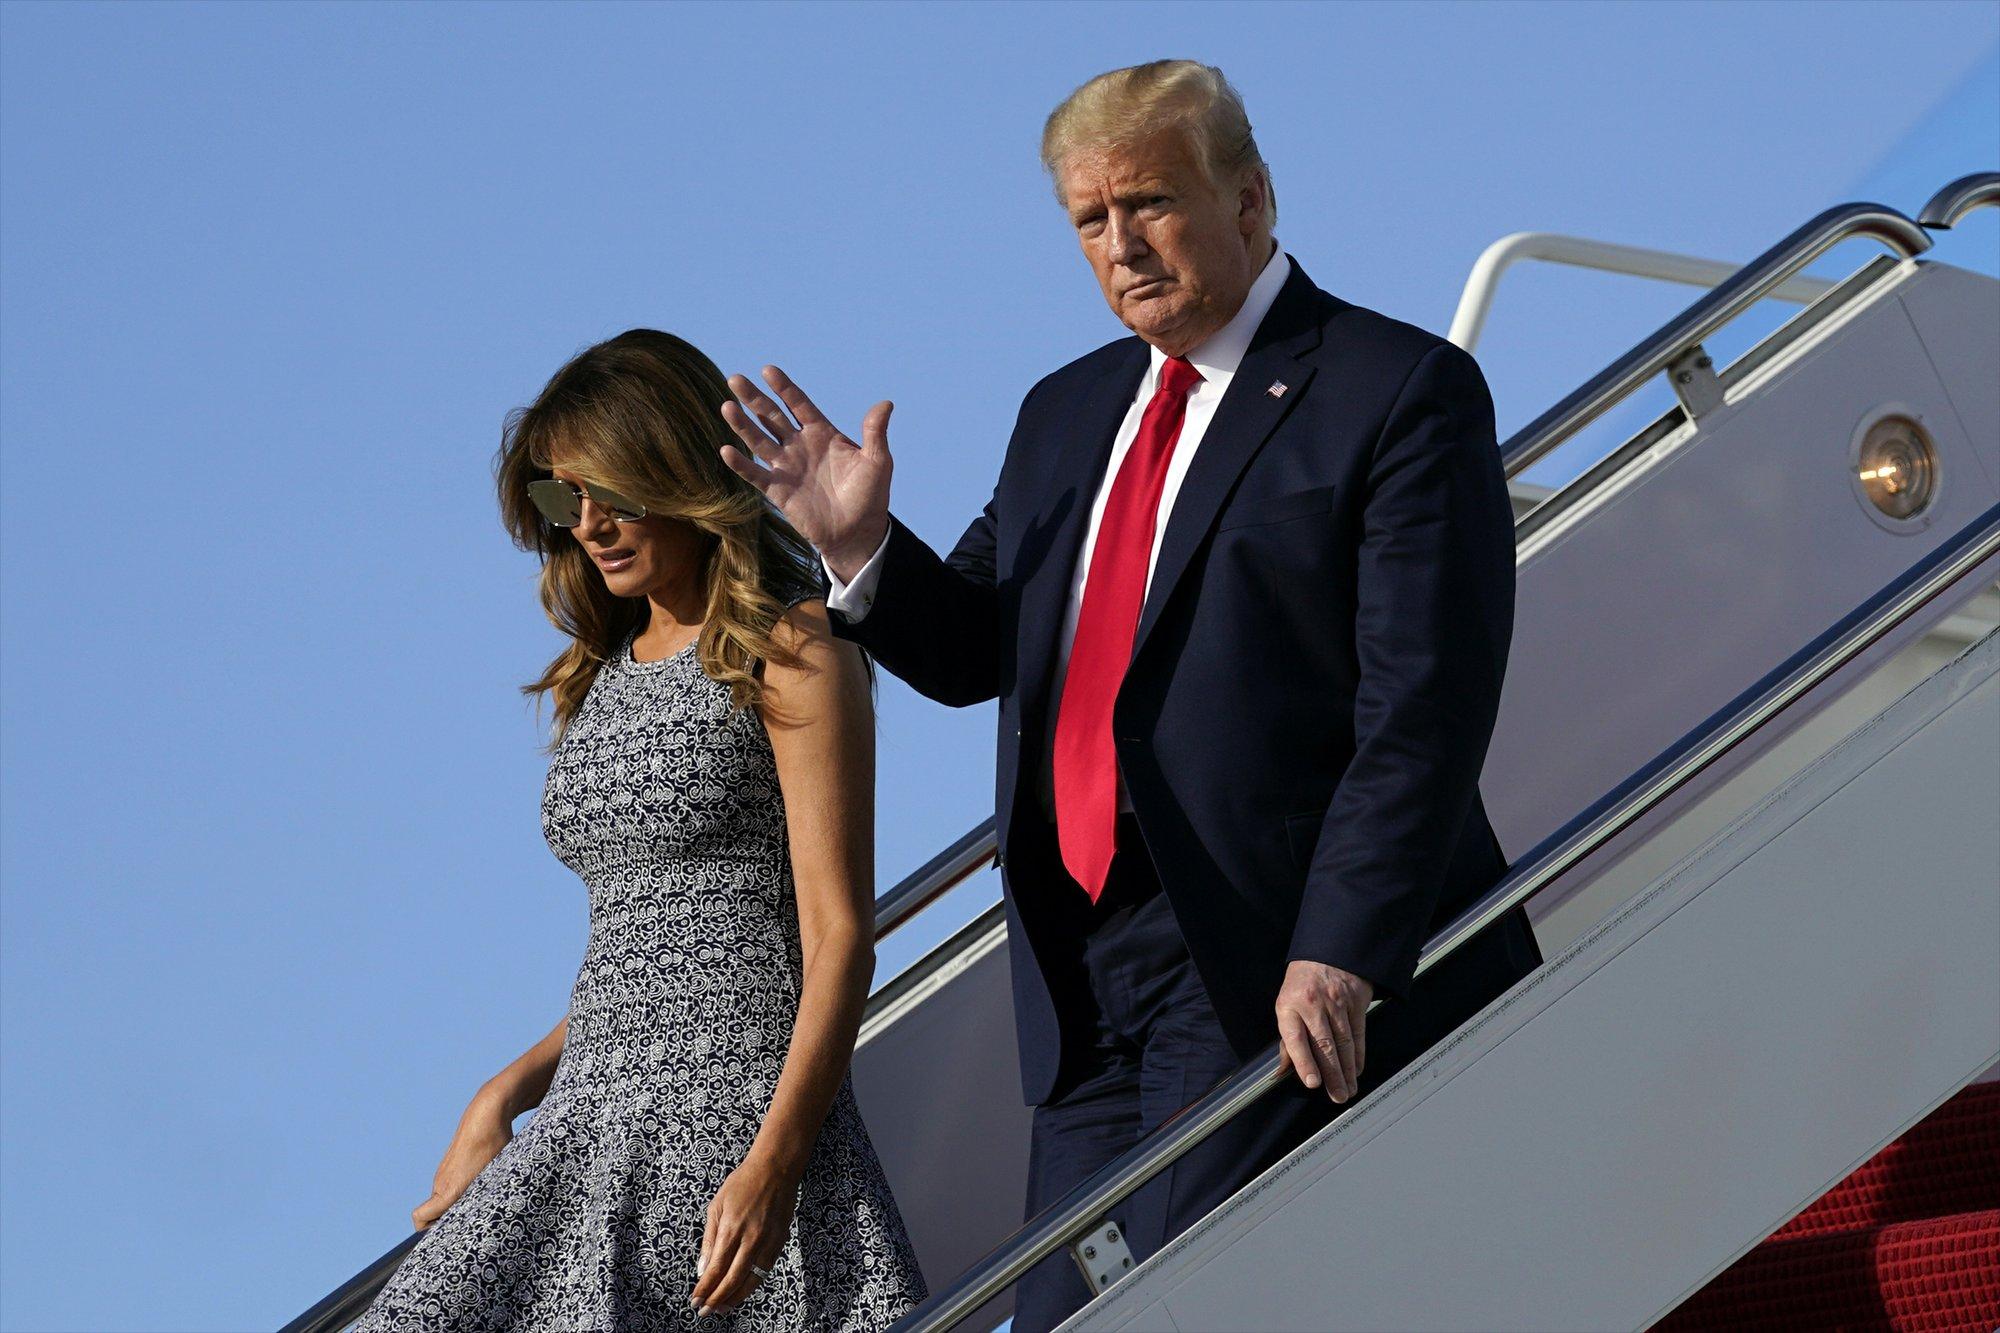 apnews.com - Zeke Miller - Twitter fact-checks Trump; he threatens new regs or shutdown